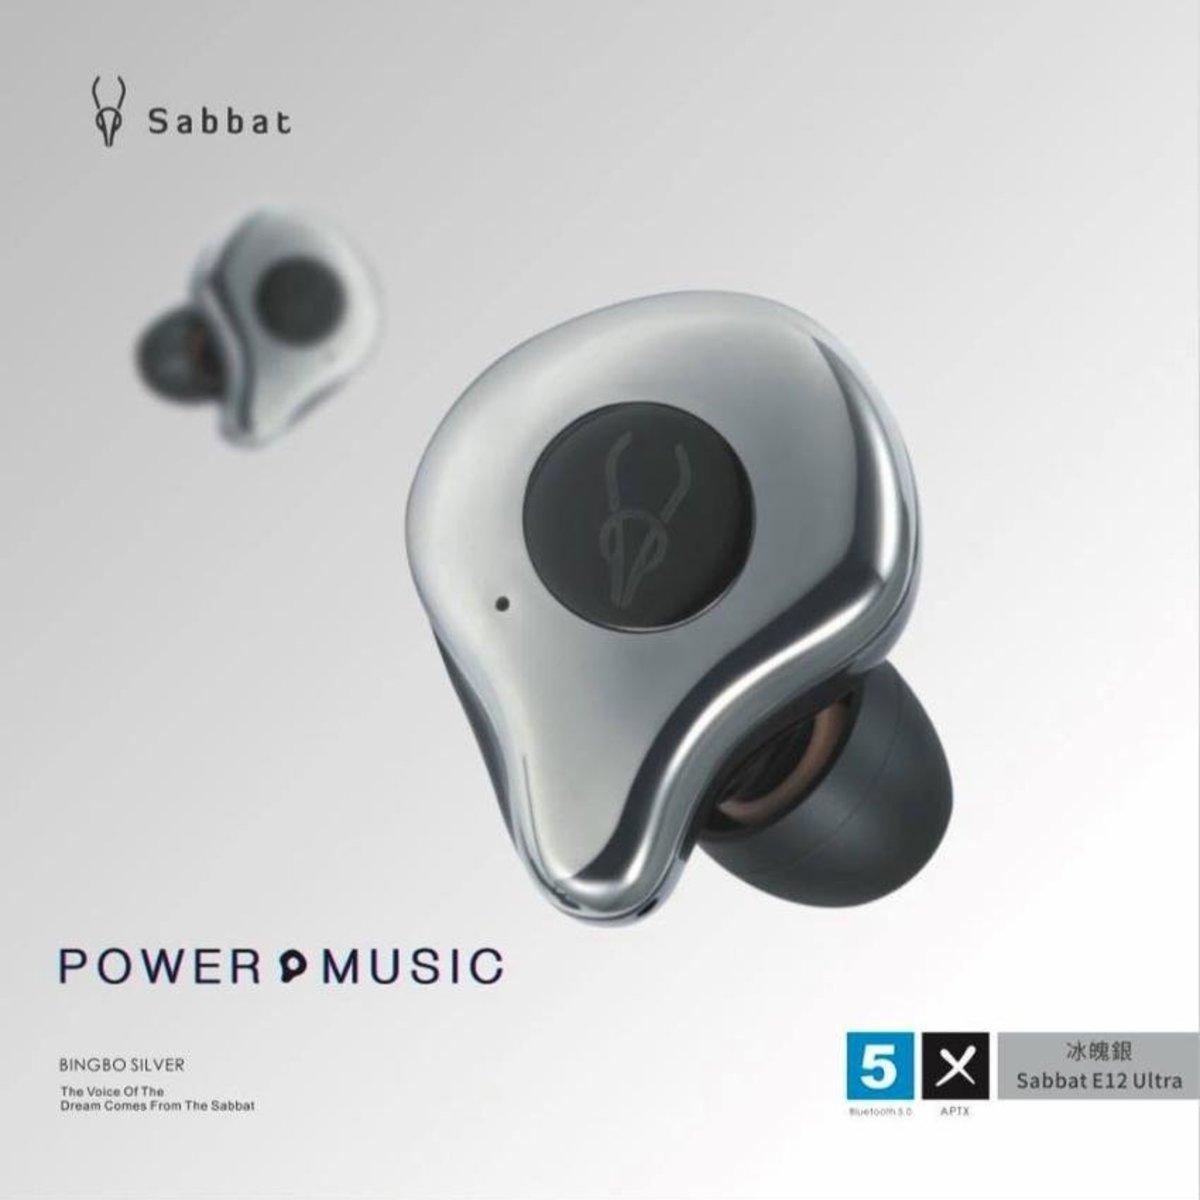 E12 Ultra 高通藍牙5.0 aptX/AAC 真無線入耳式耳機[冰魄銀色]